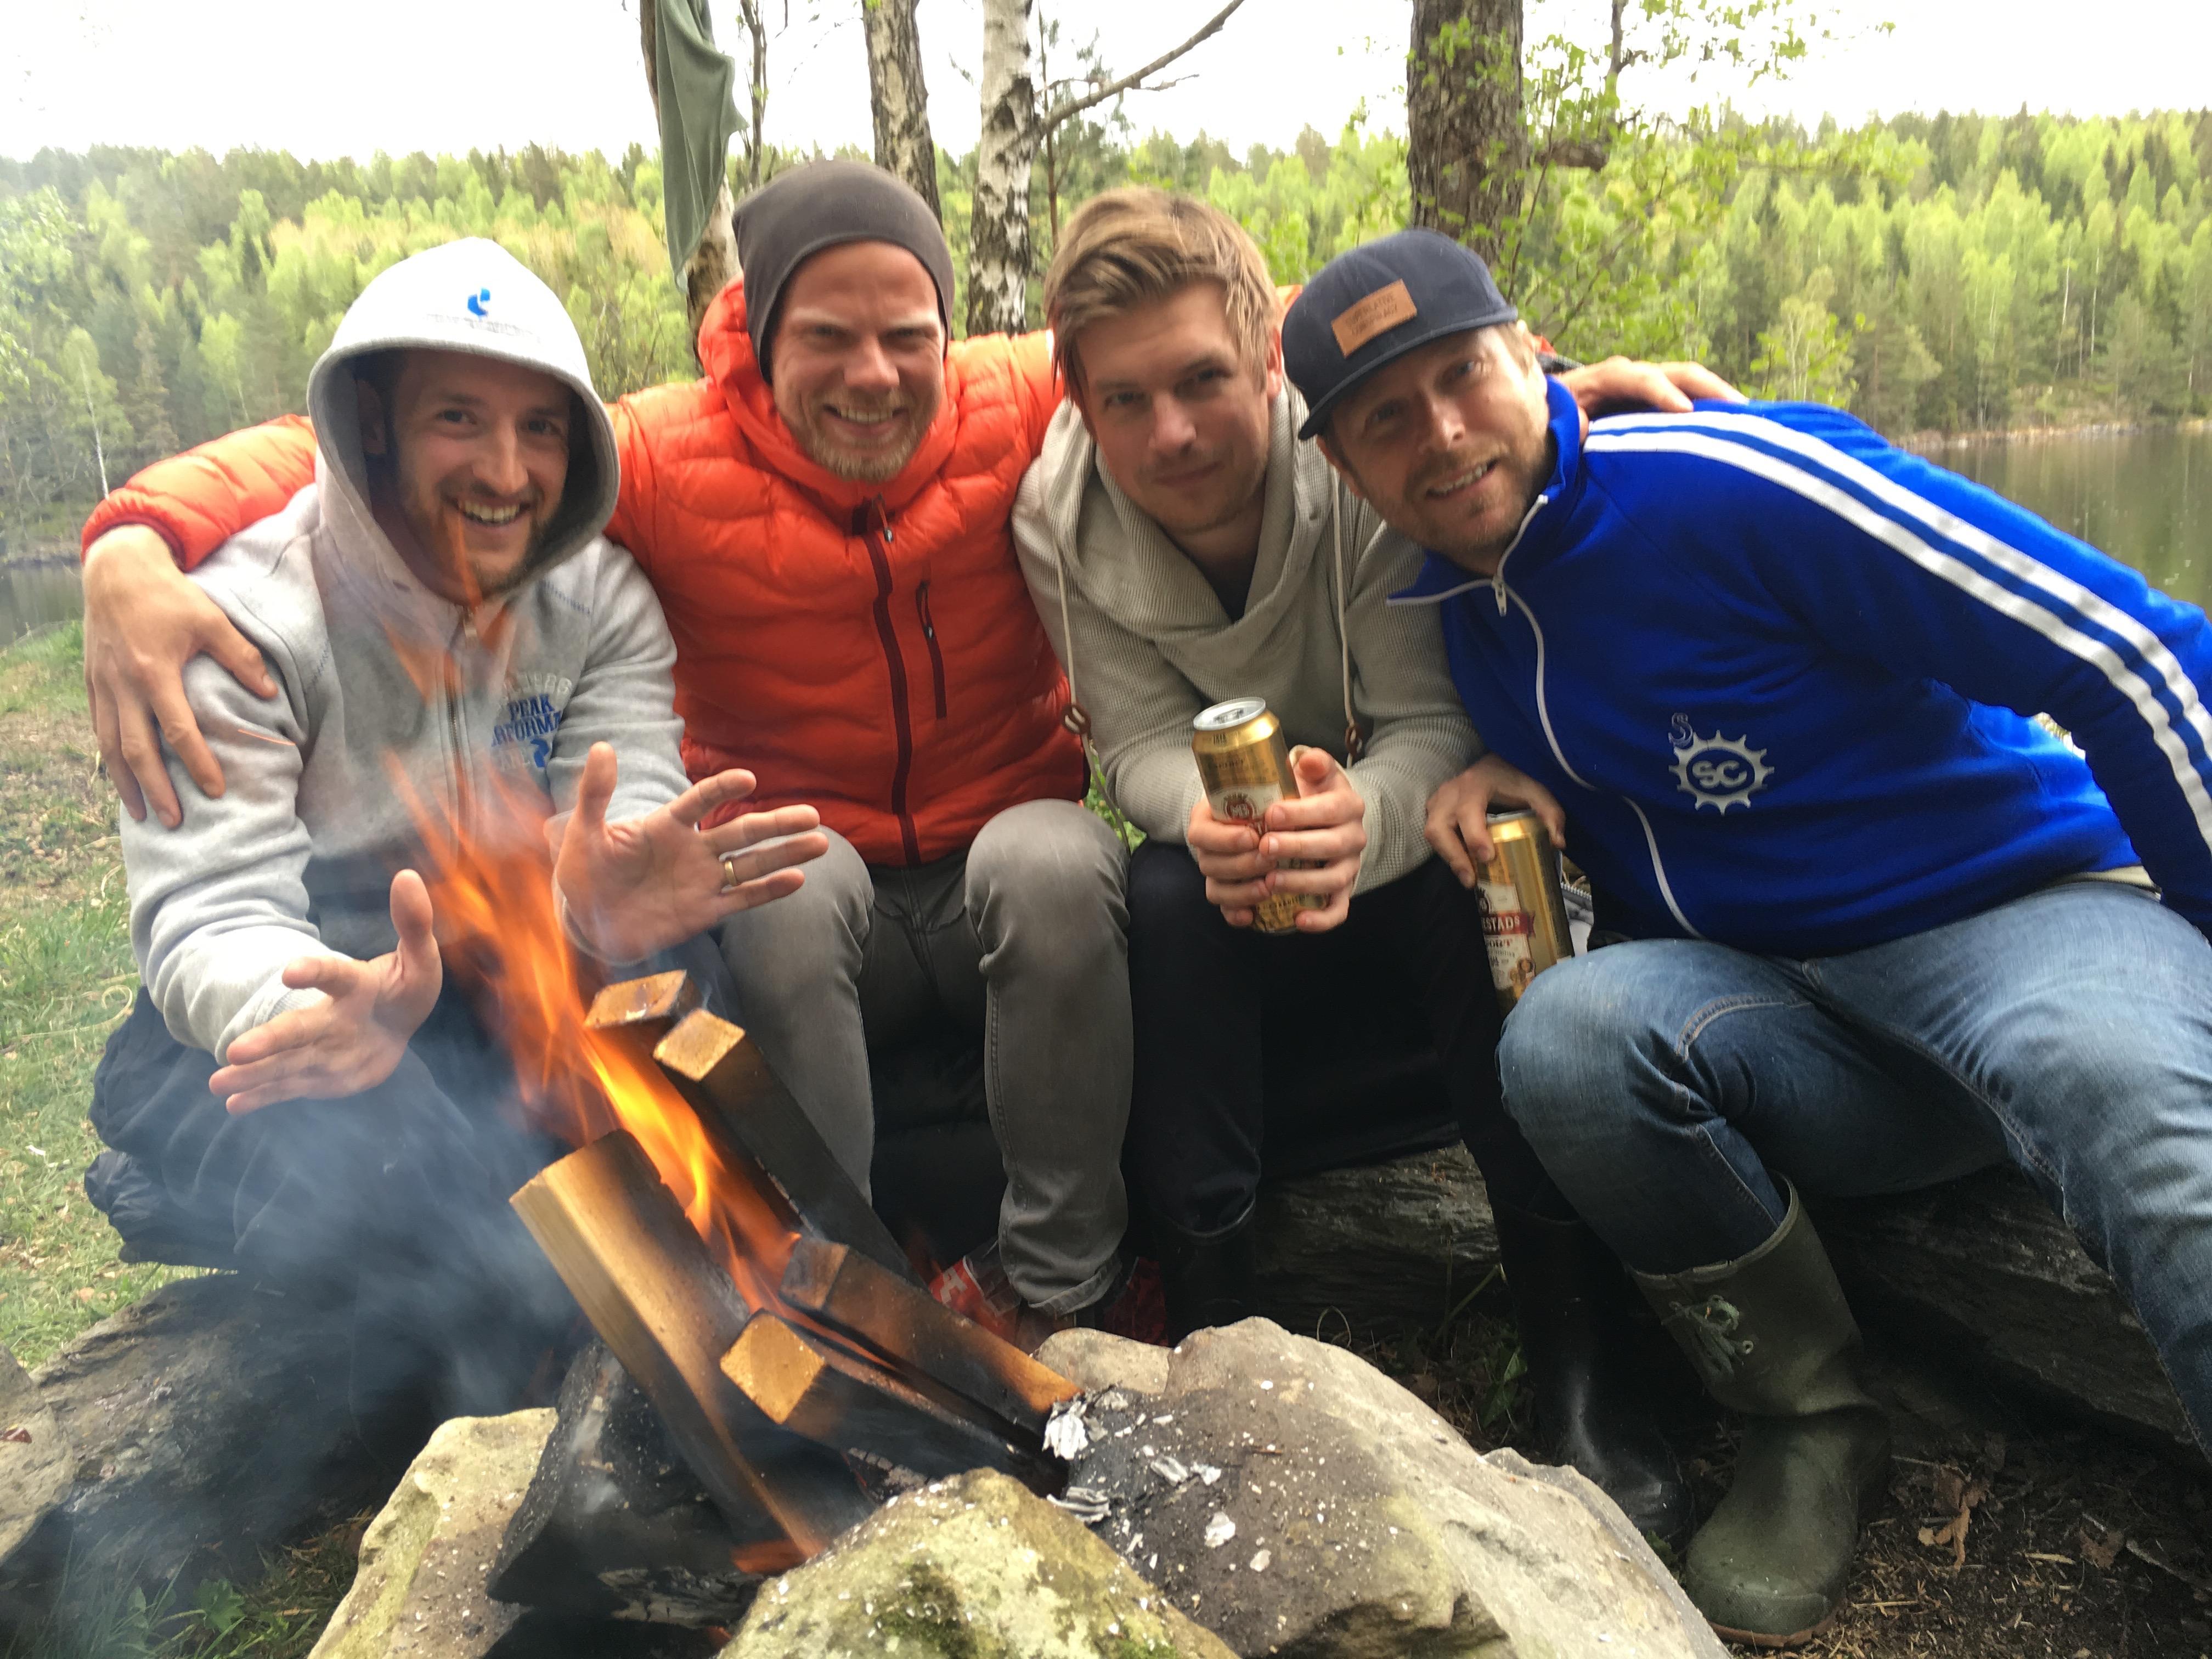 grupp-bild-lager-eld-grill